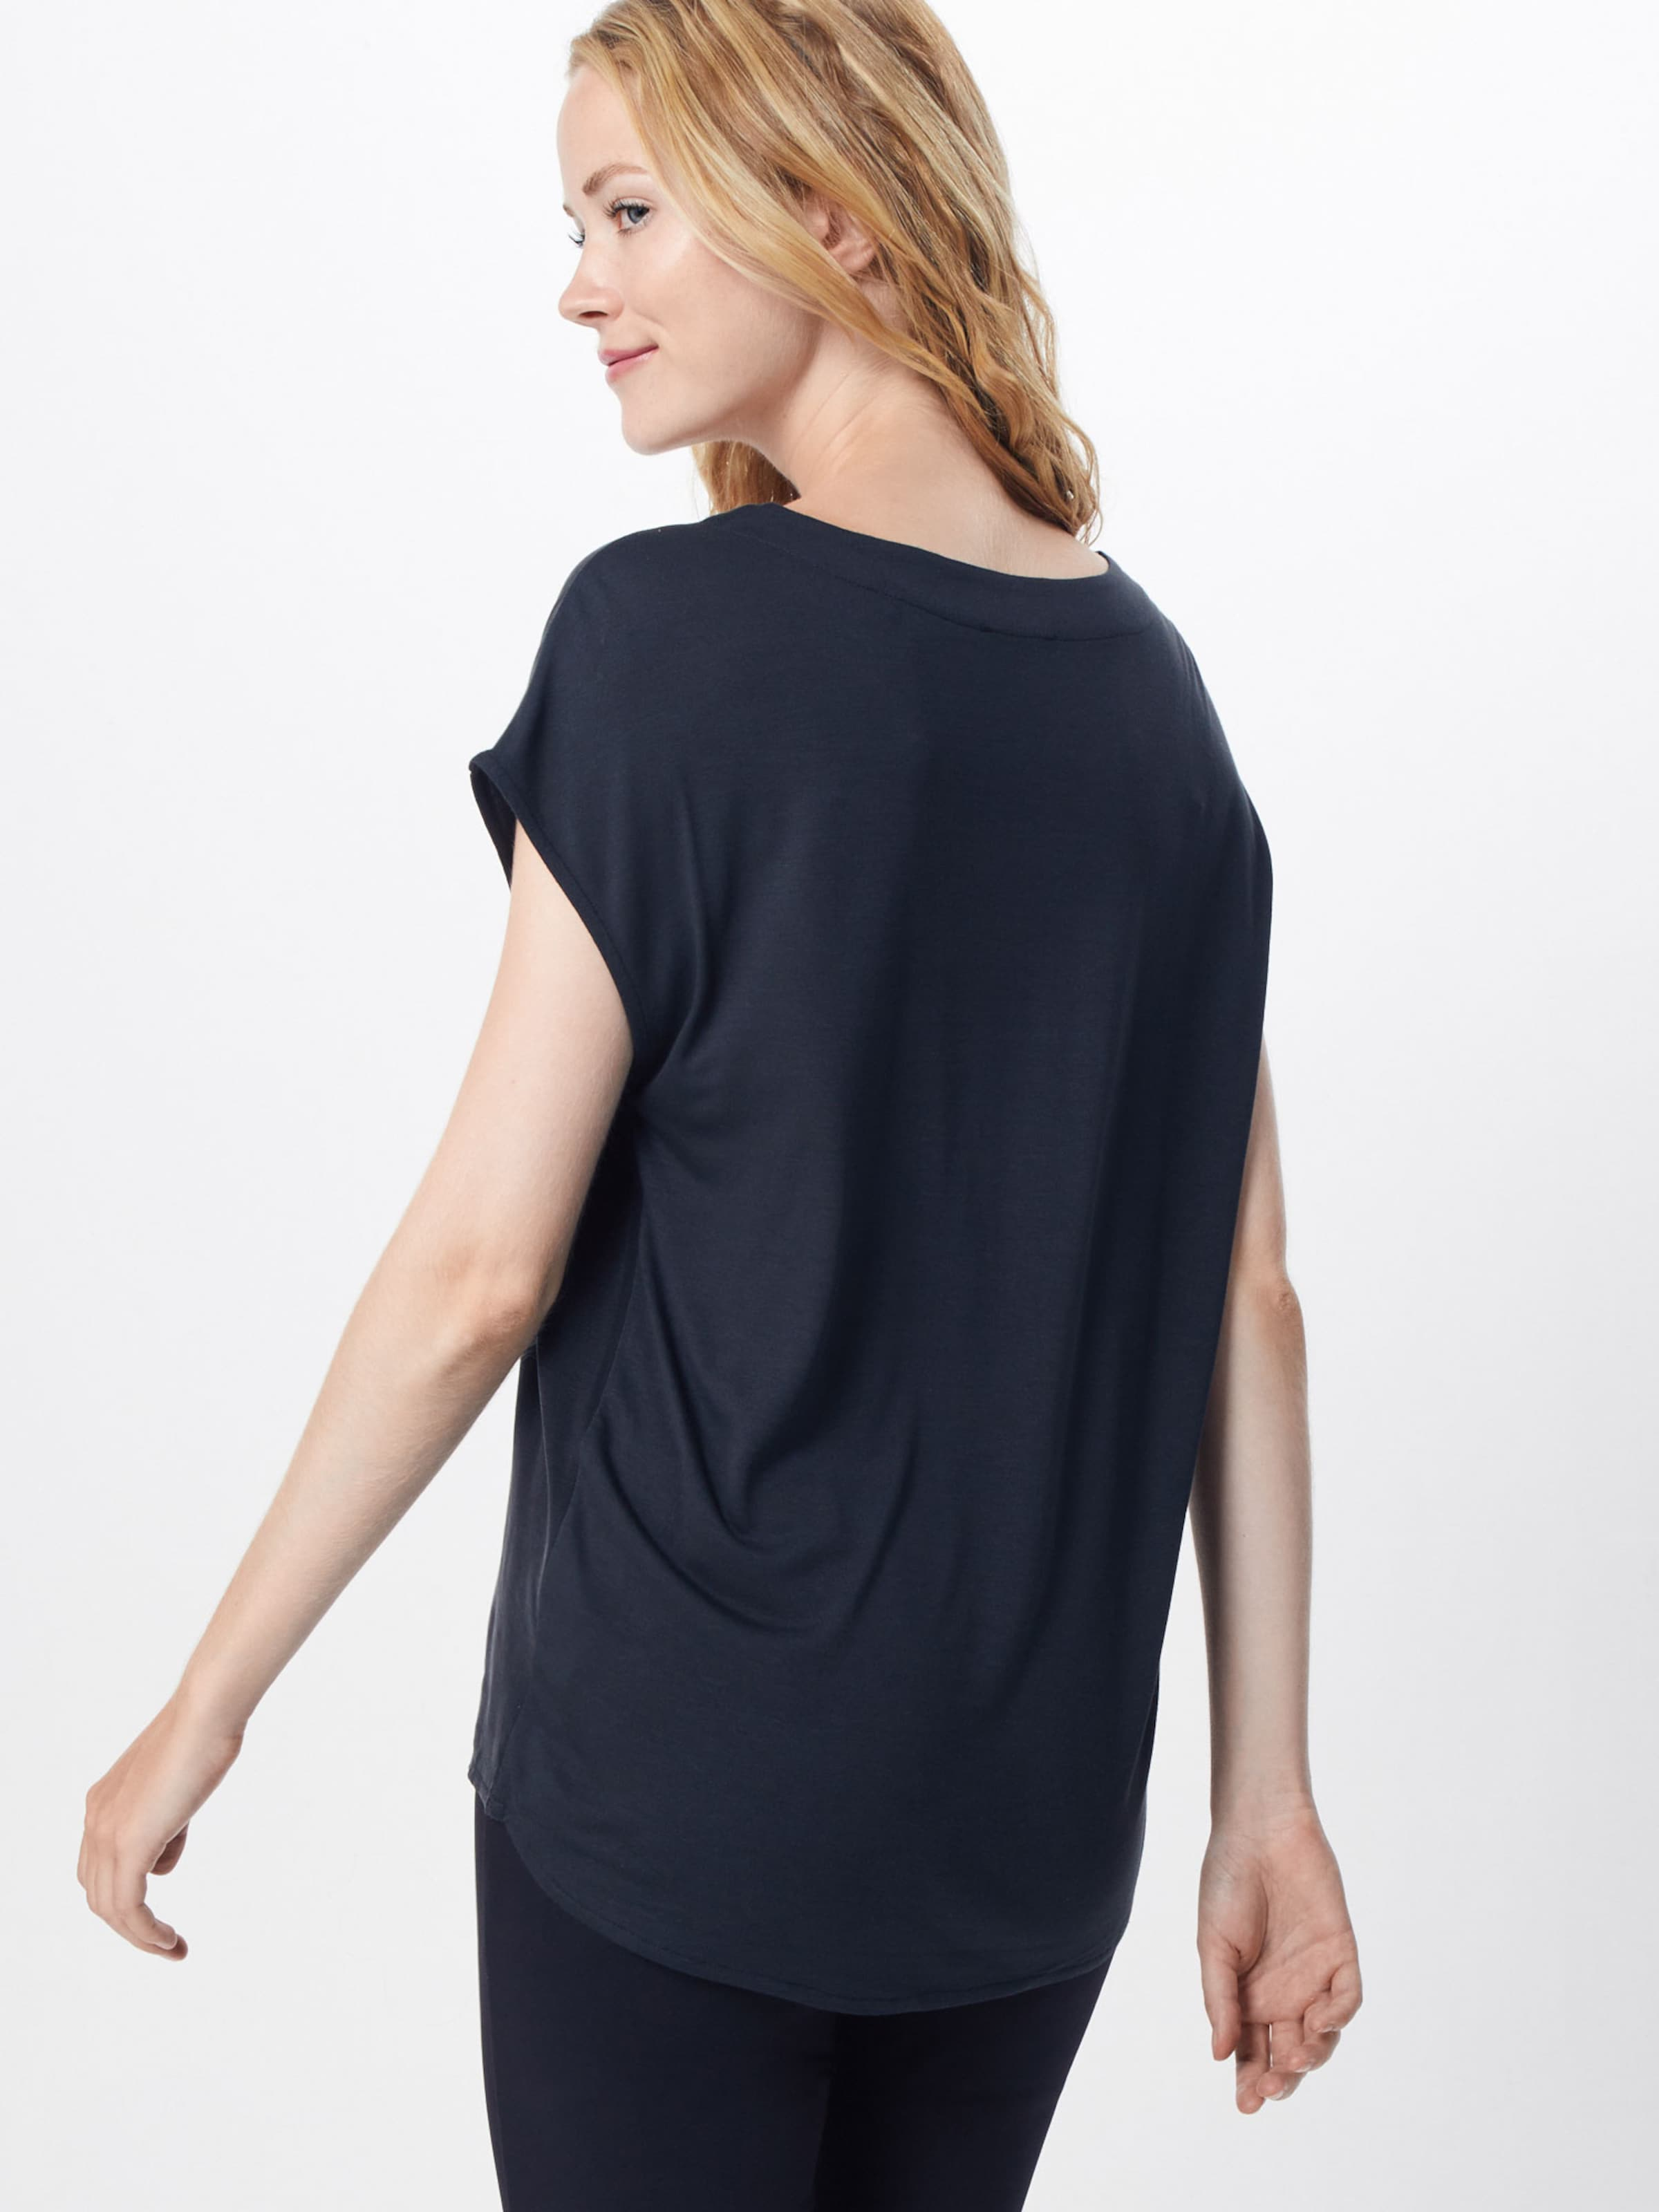 Graumeliert Opus In Opus Graumeliert Shirt 'silvia' 'silvia' Shirt In zqMLUVSpG